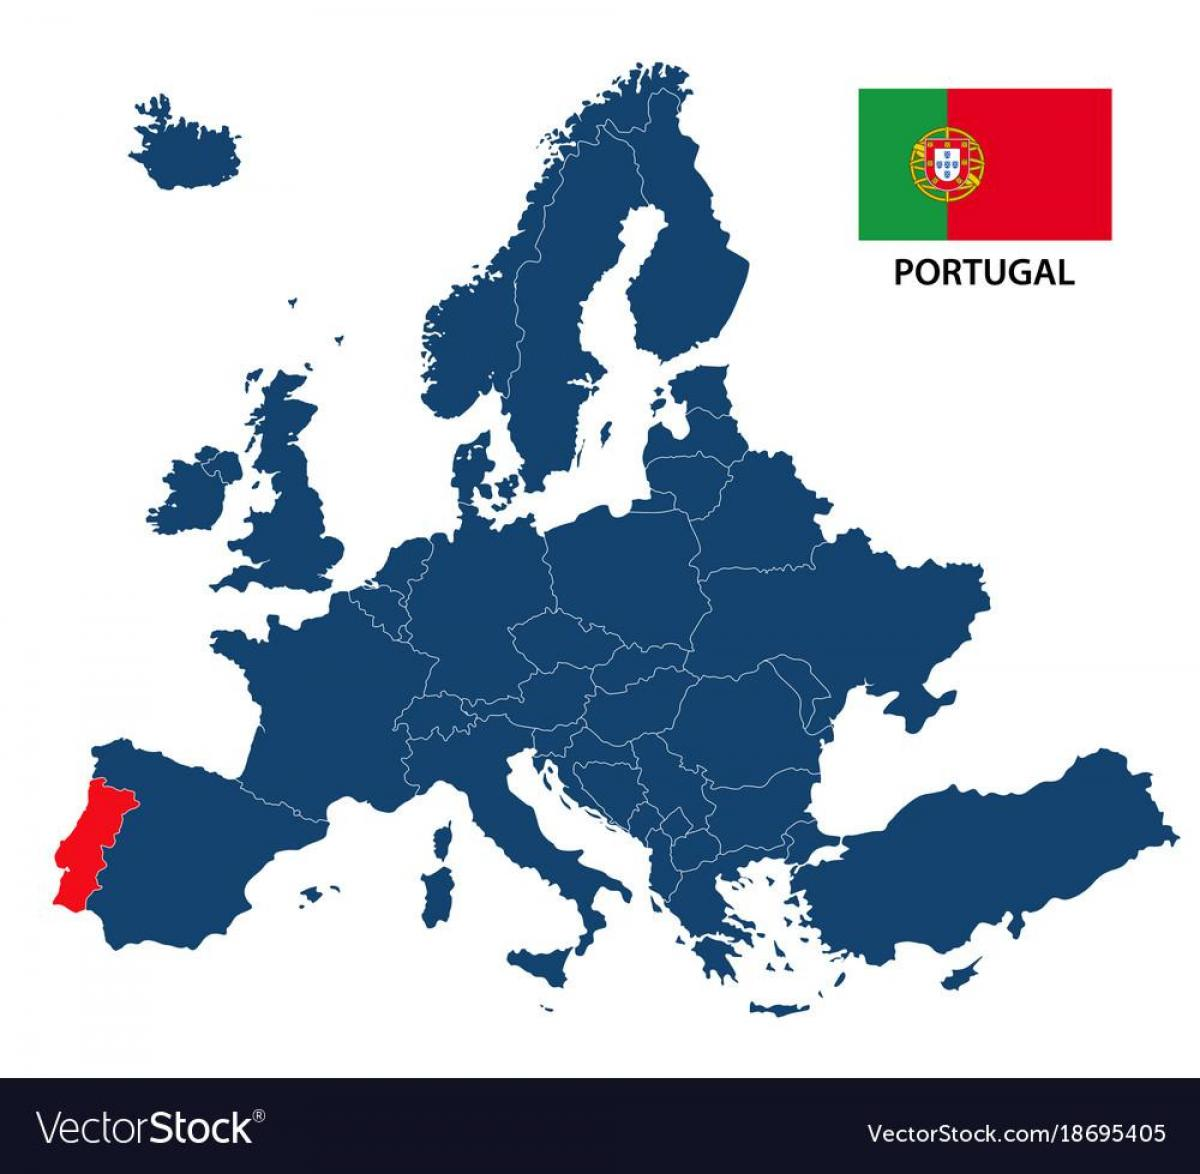 mapa portugal na europa Europa mapa Portugal   Mapa Portugal Europan (Hegoaldeko Europa  mapa portugal na europa